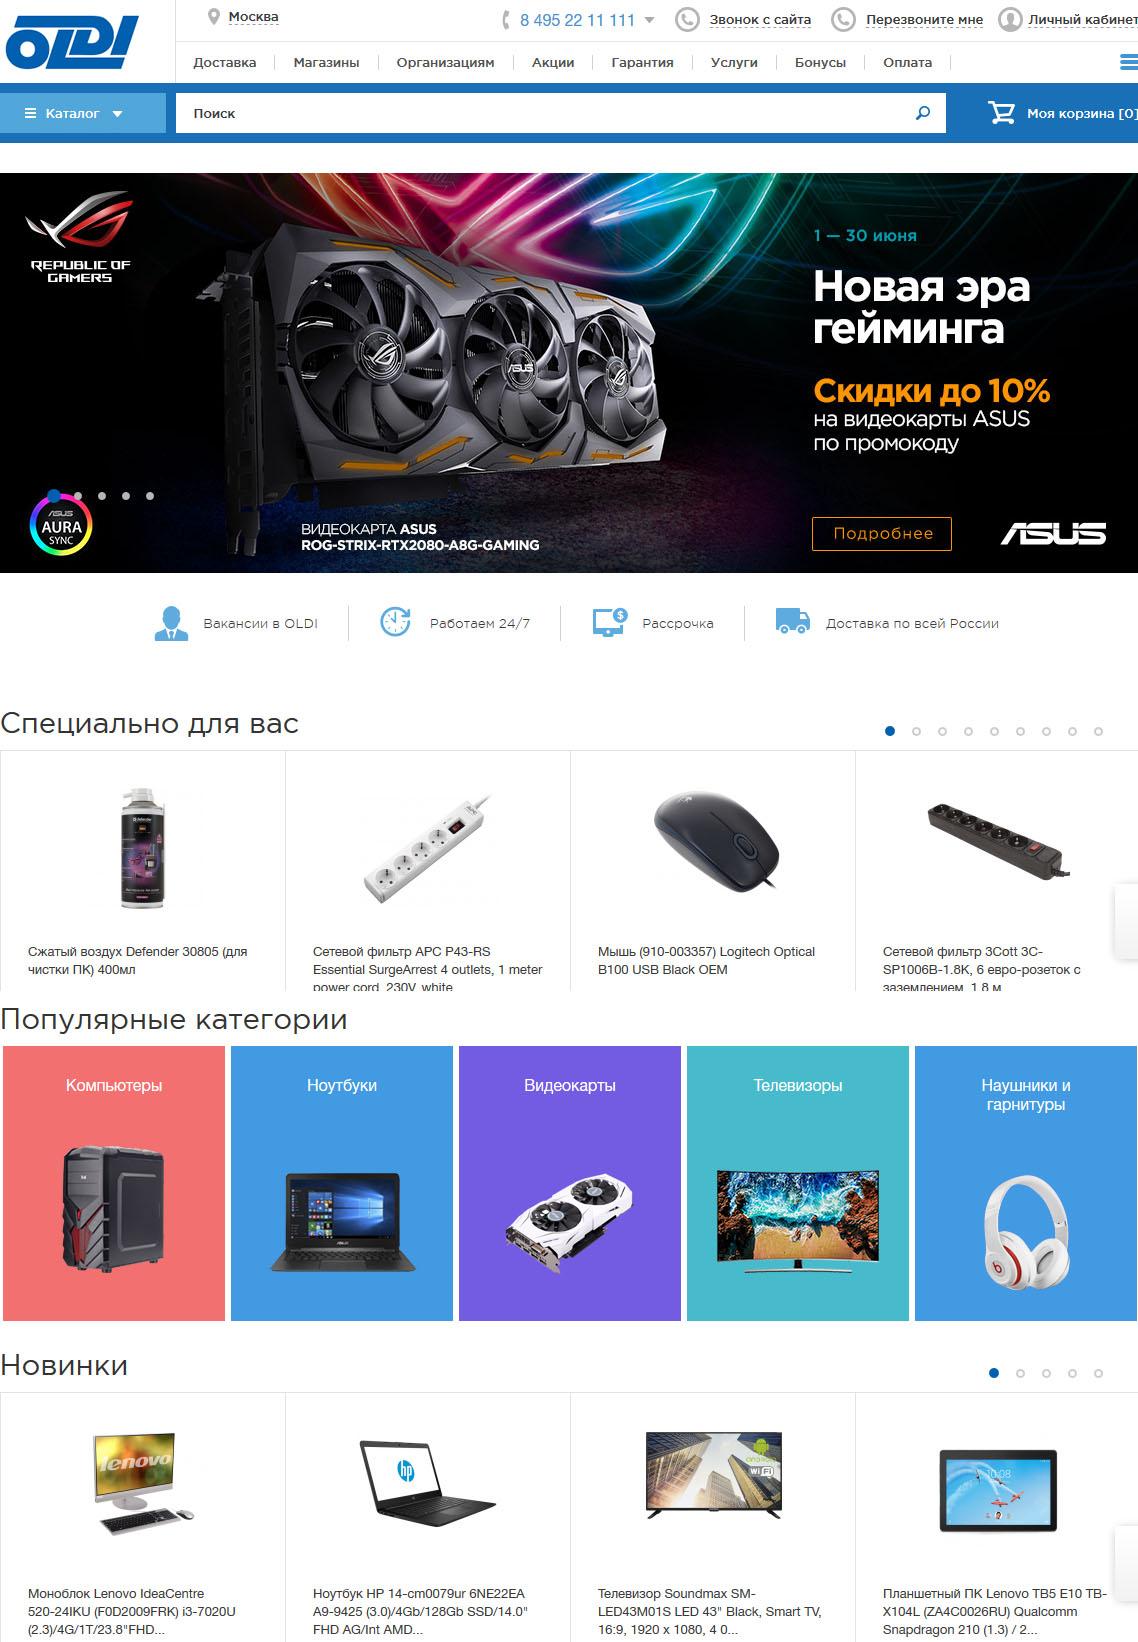 Интернет-магазин Олди